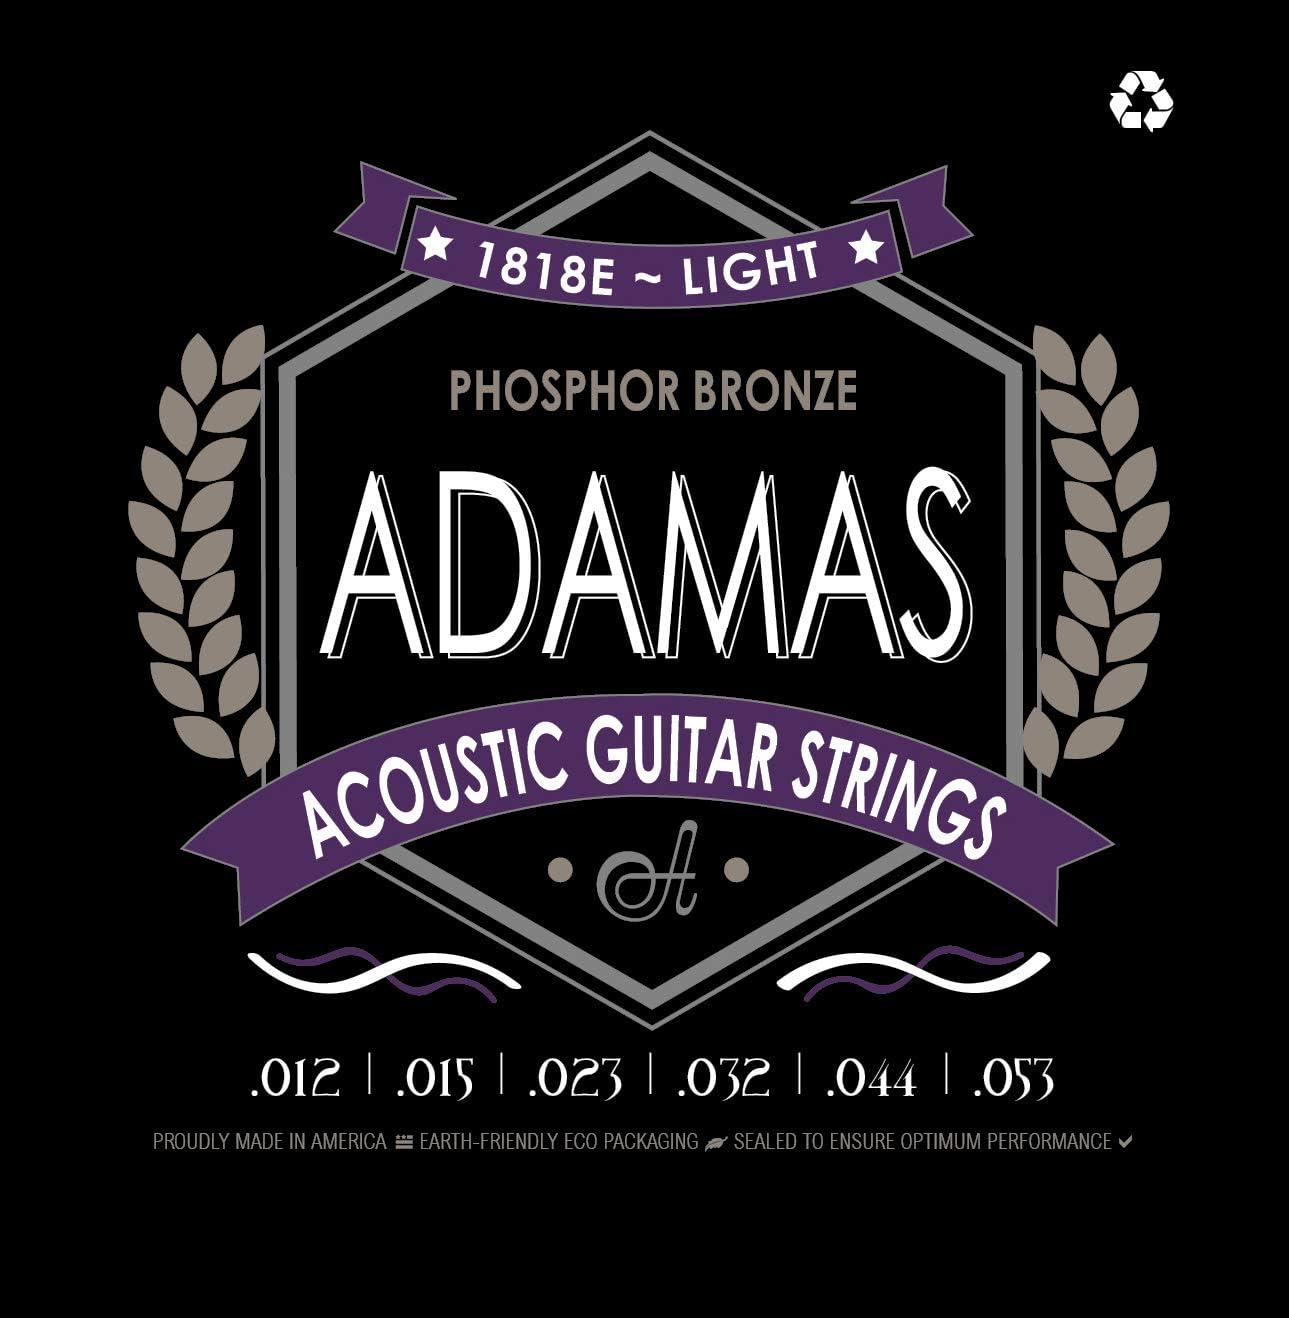 Adamas fósforo bronce Guitarra acústica cuerdas Light .012-.053